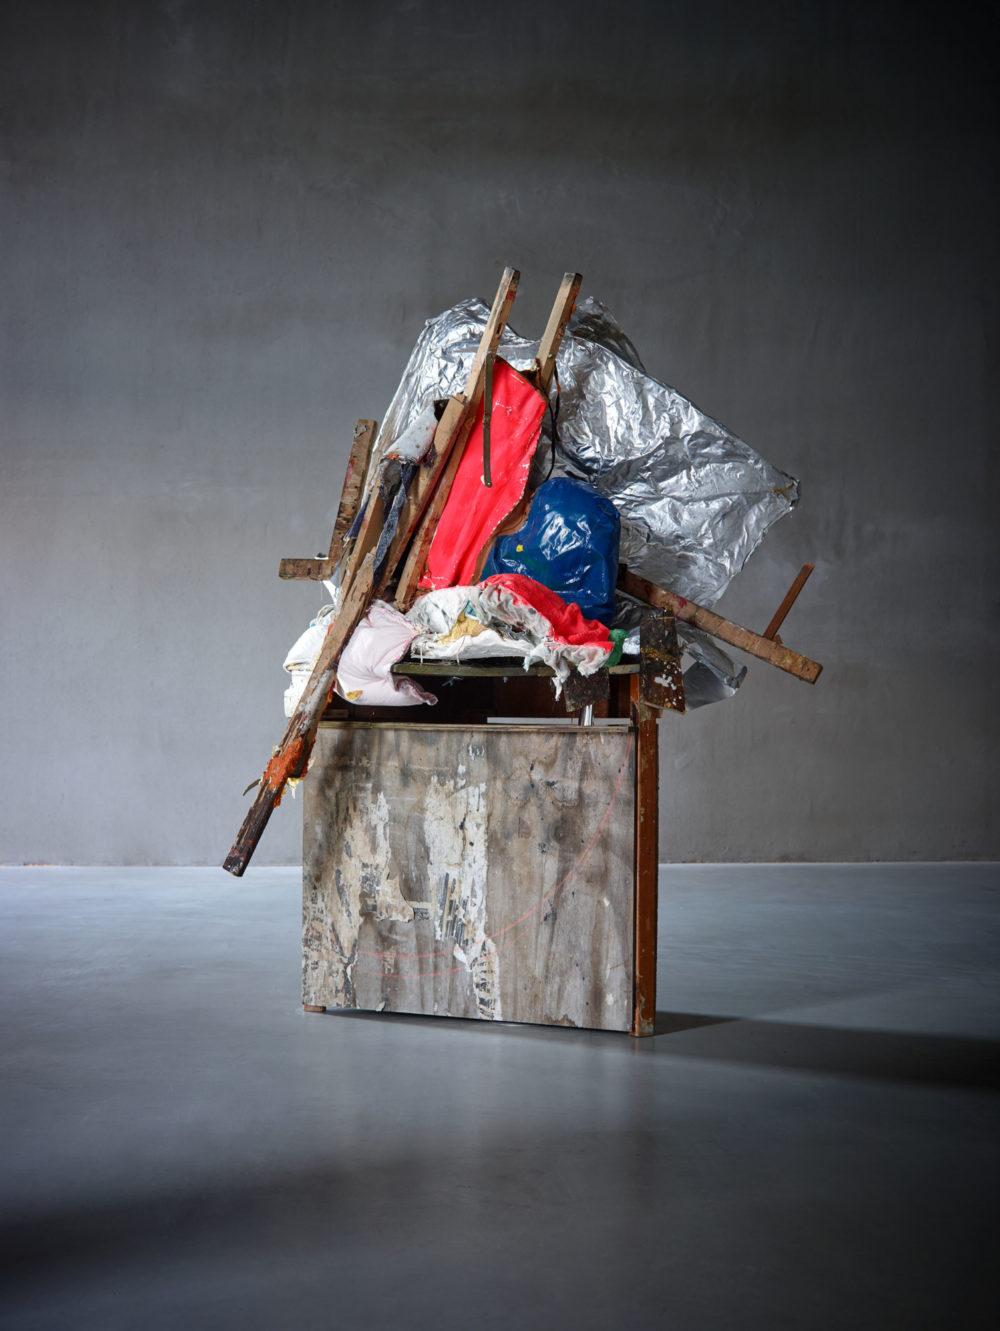 Installation view Mont Ventoux #37 at Axel Vervoordt Gallery